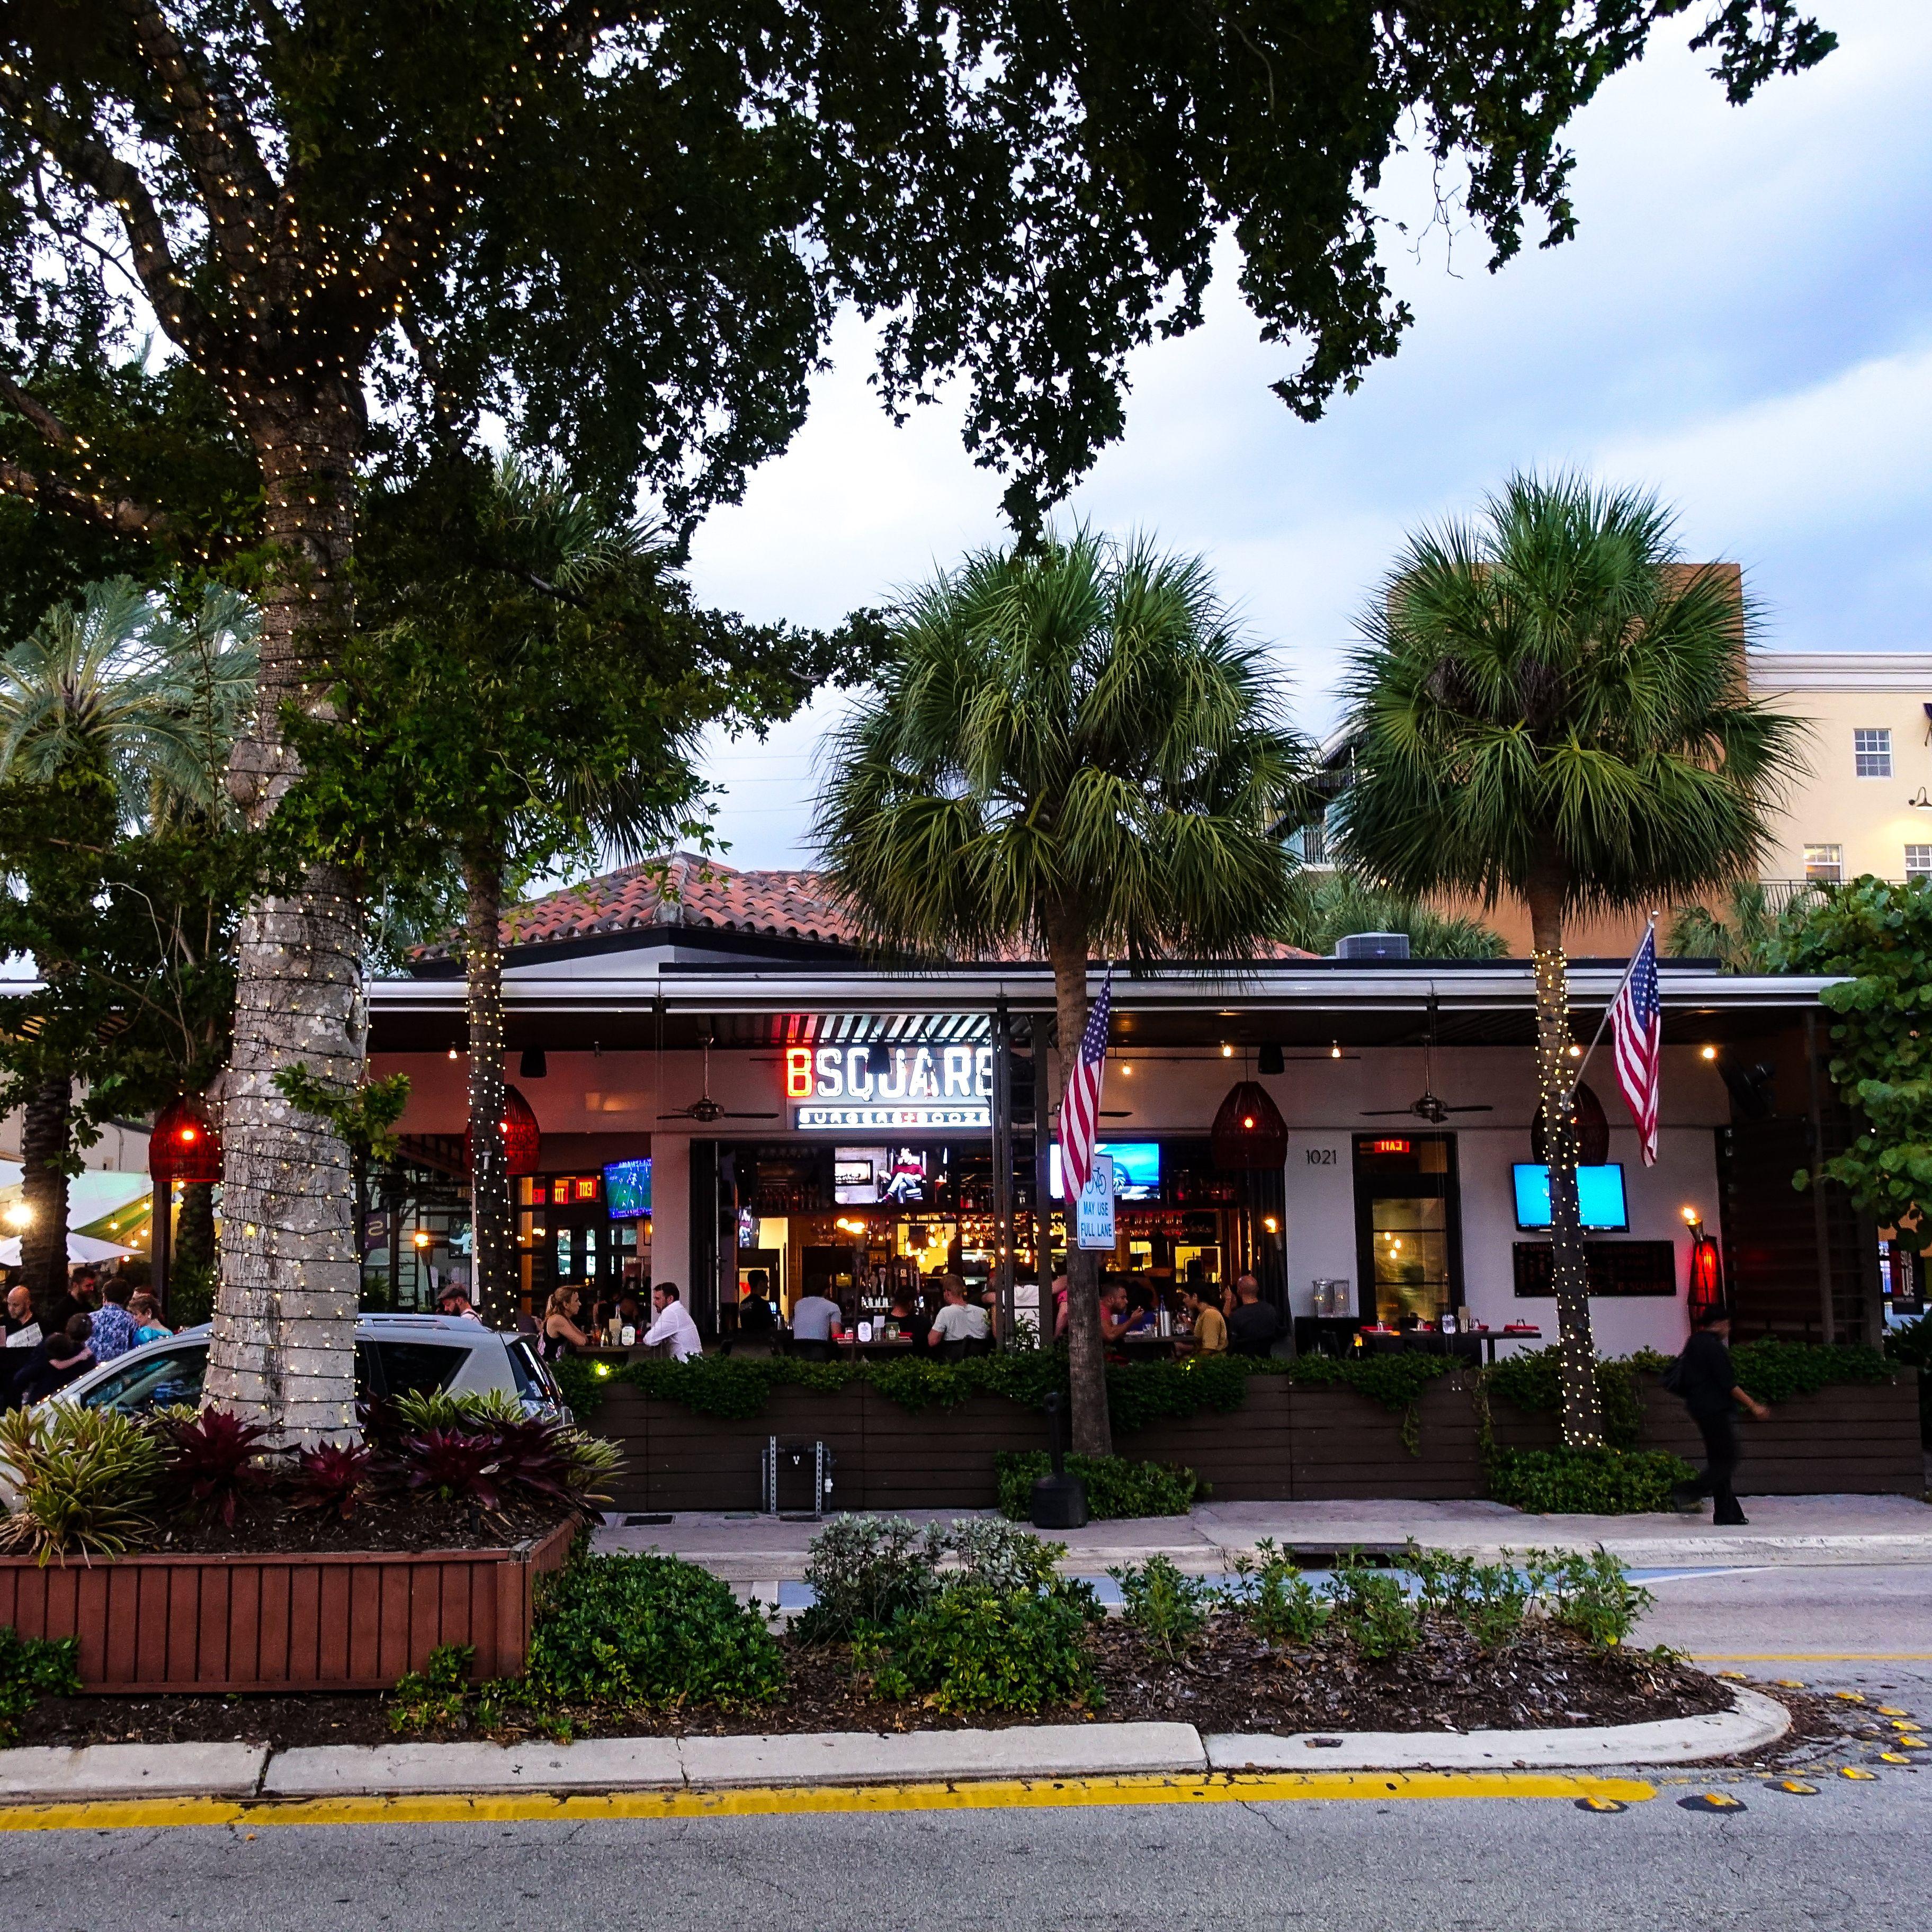 Las Olas Blvd Nice Outdoor Restaurants Great Place To